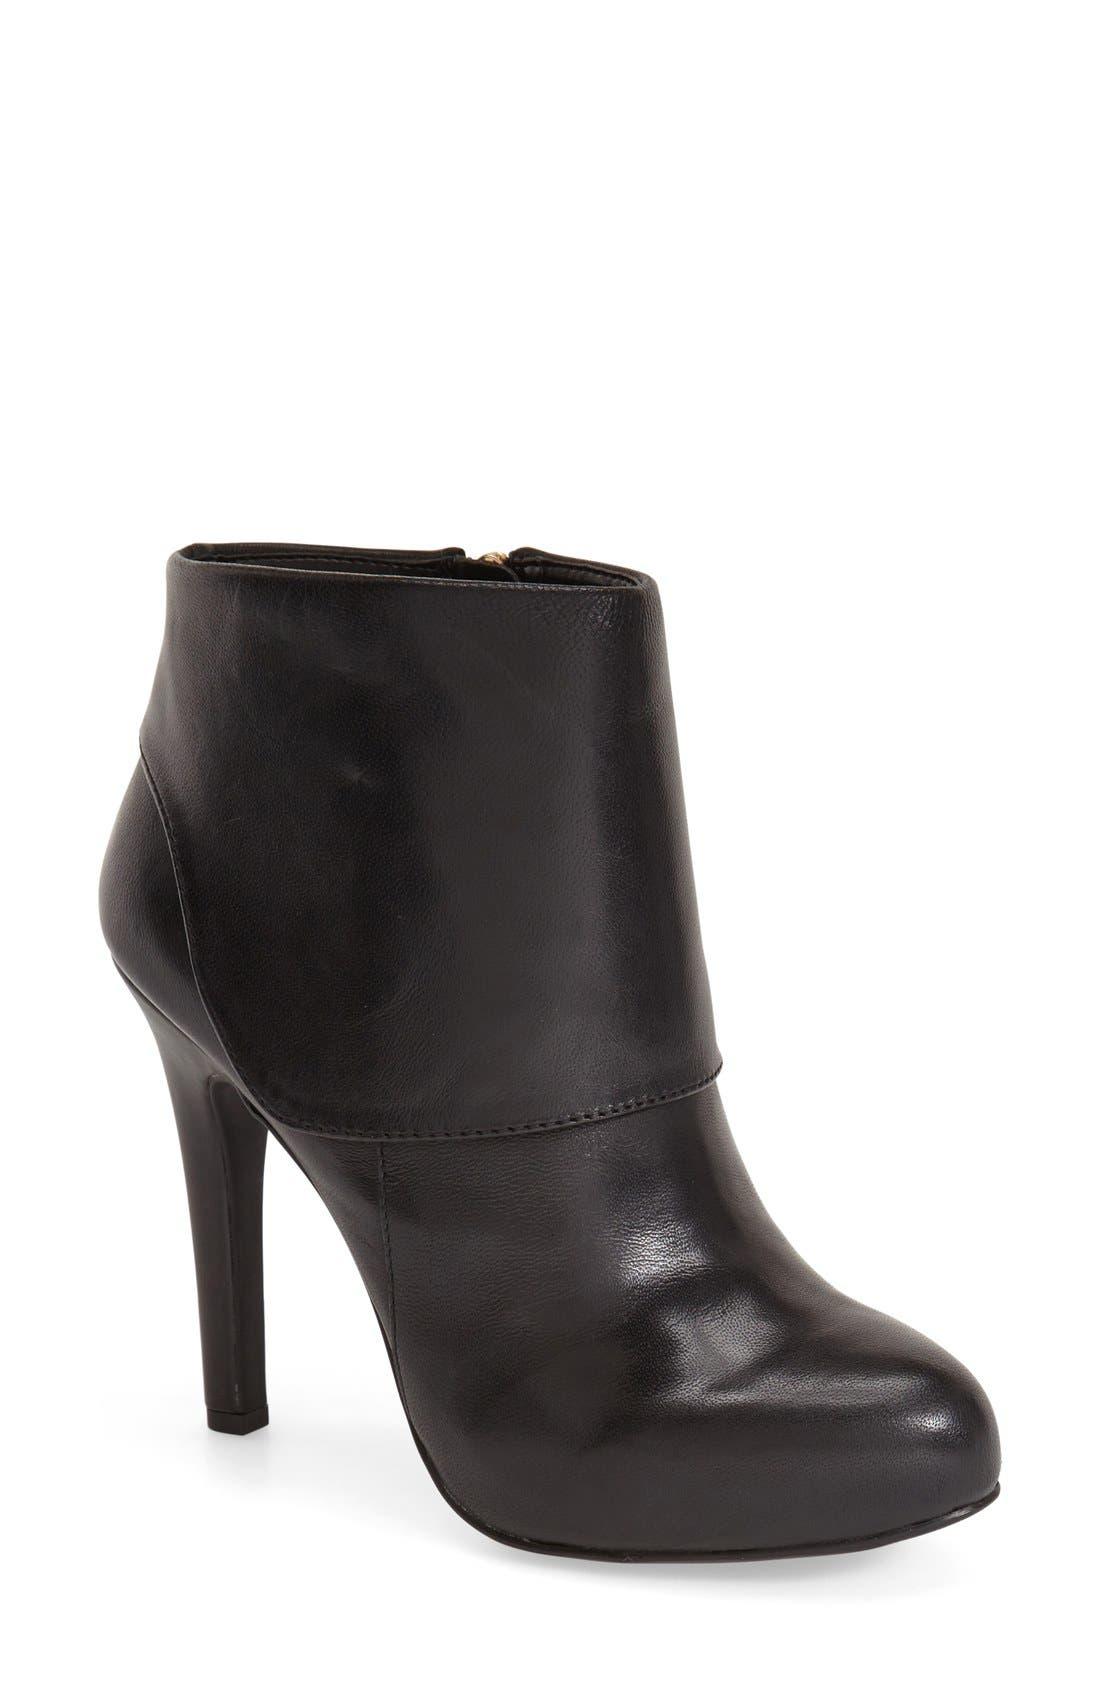 'Addey' Platform Bootie,                         Main,                         color, Black Leather